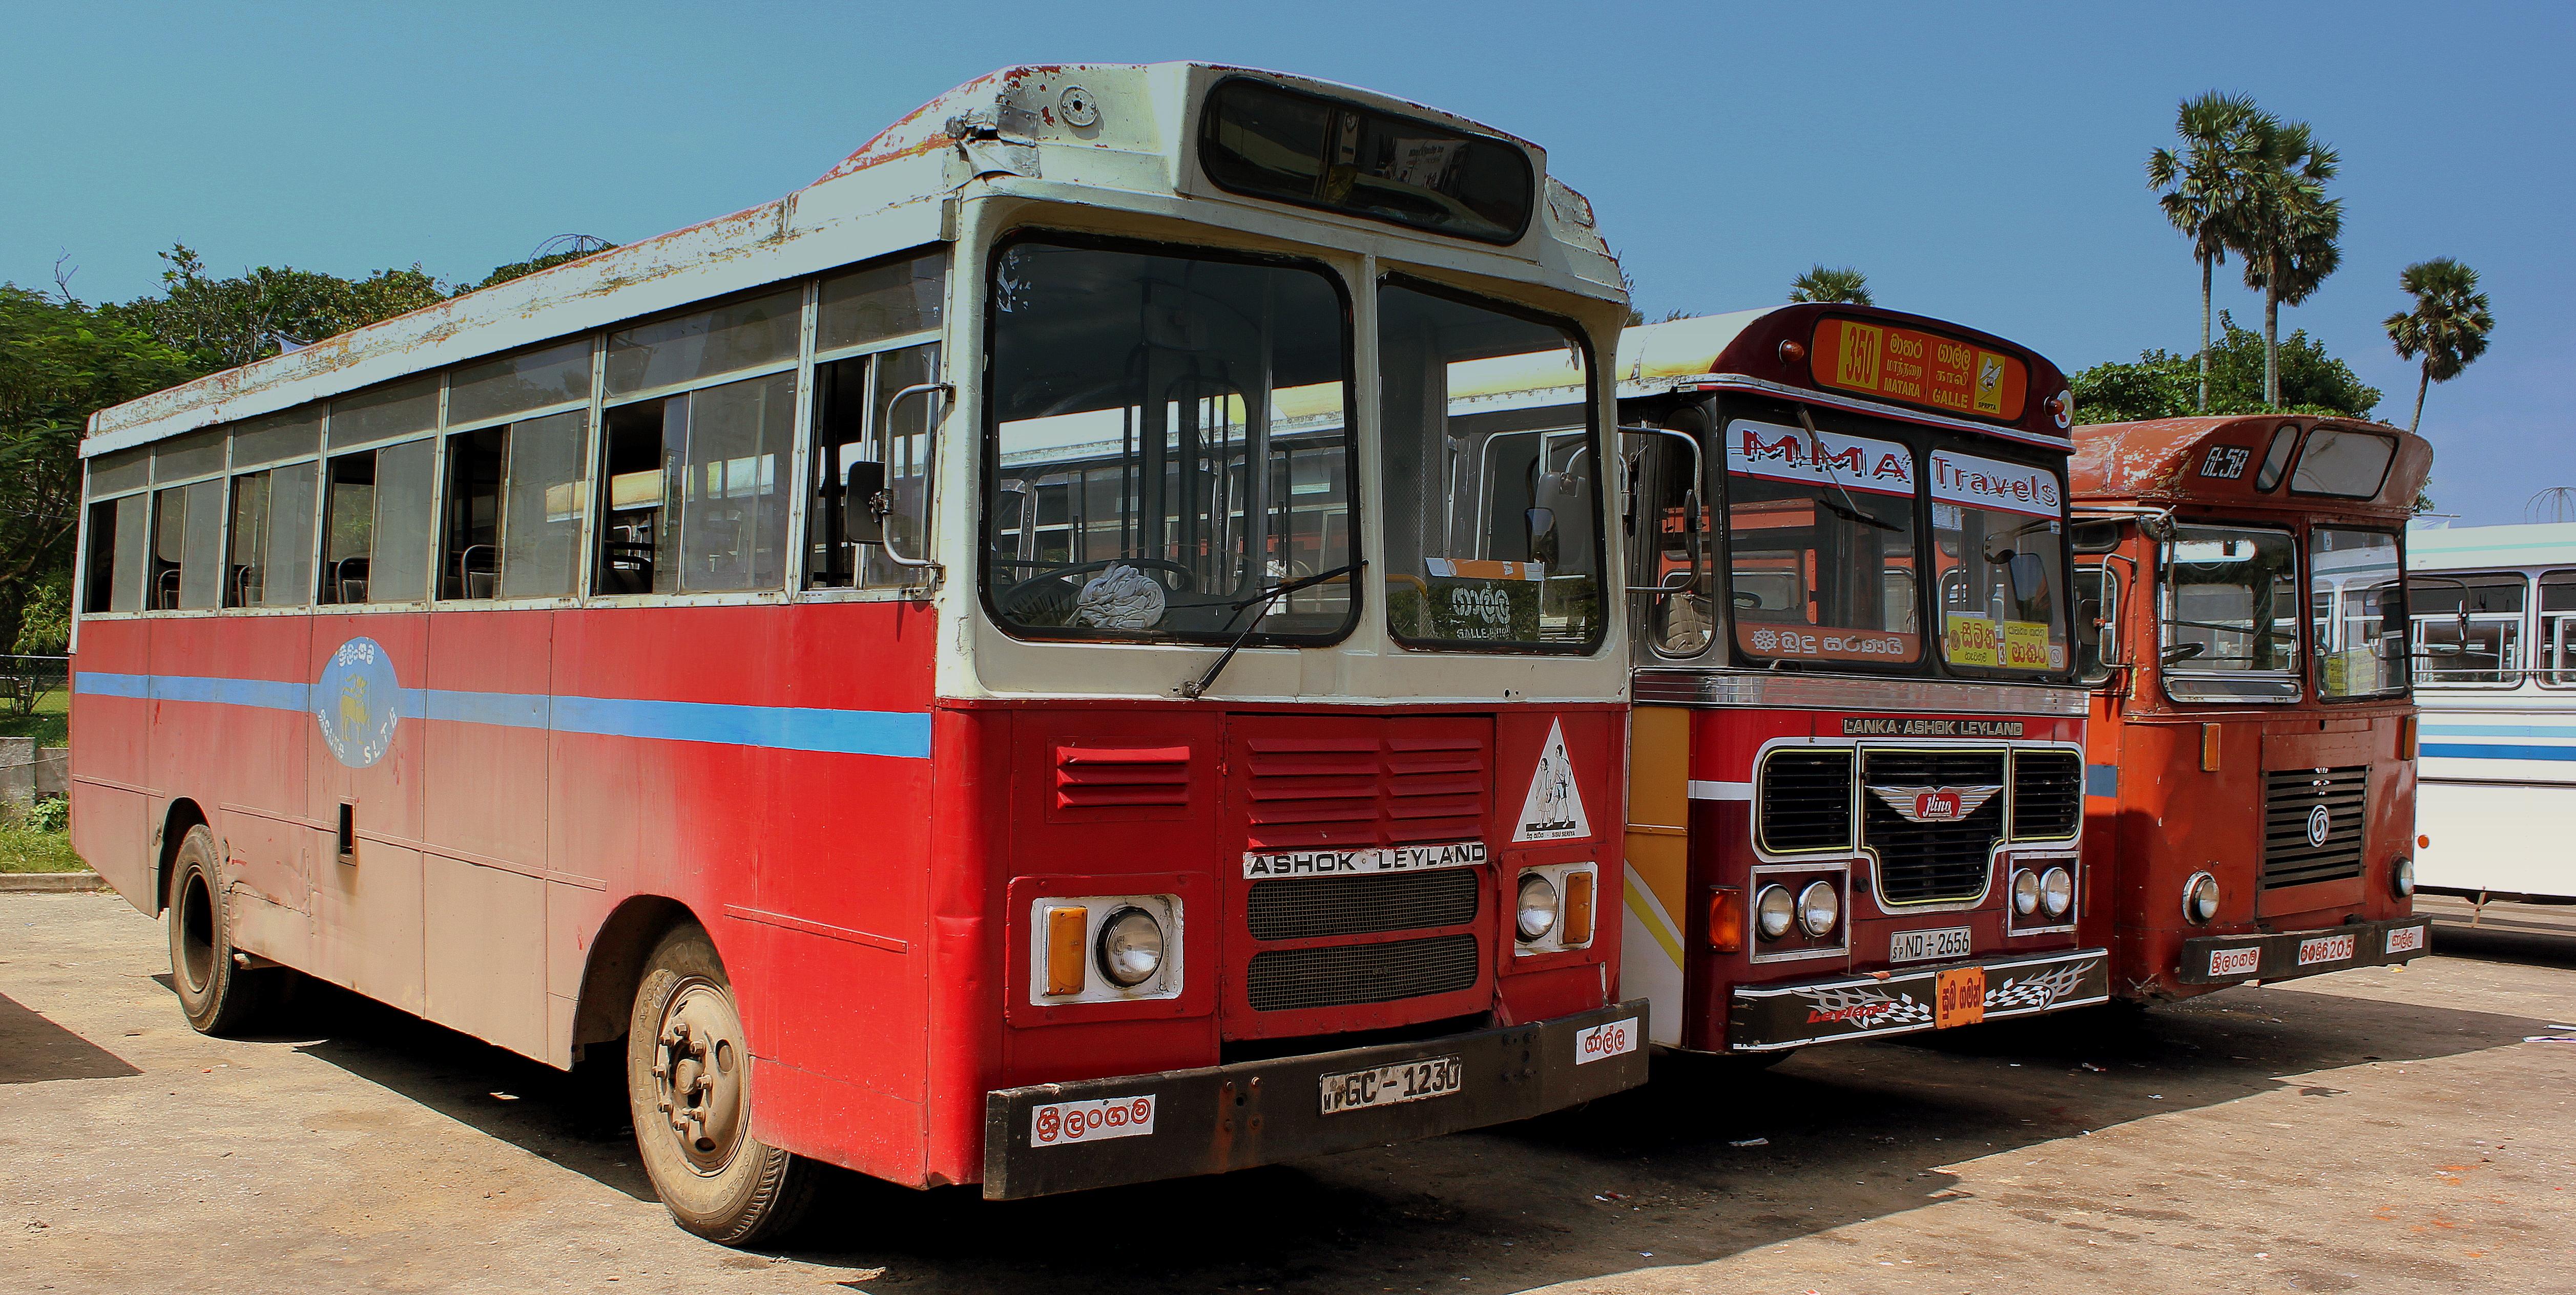 Ashok Leyland Viking Sri Lanka Check Out Ashok Leyland: Lanka Ashok Leyland, Check Out Lanka Ashok Leyland : CnTRAVEL